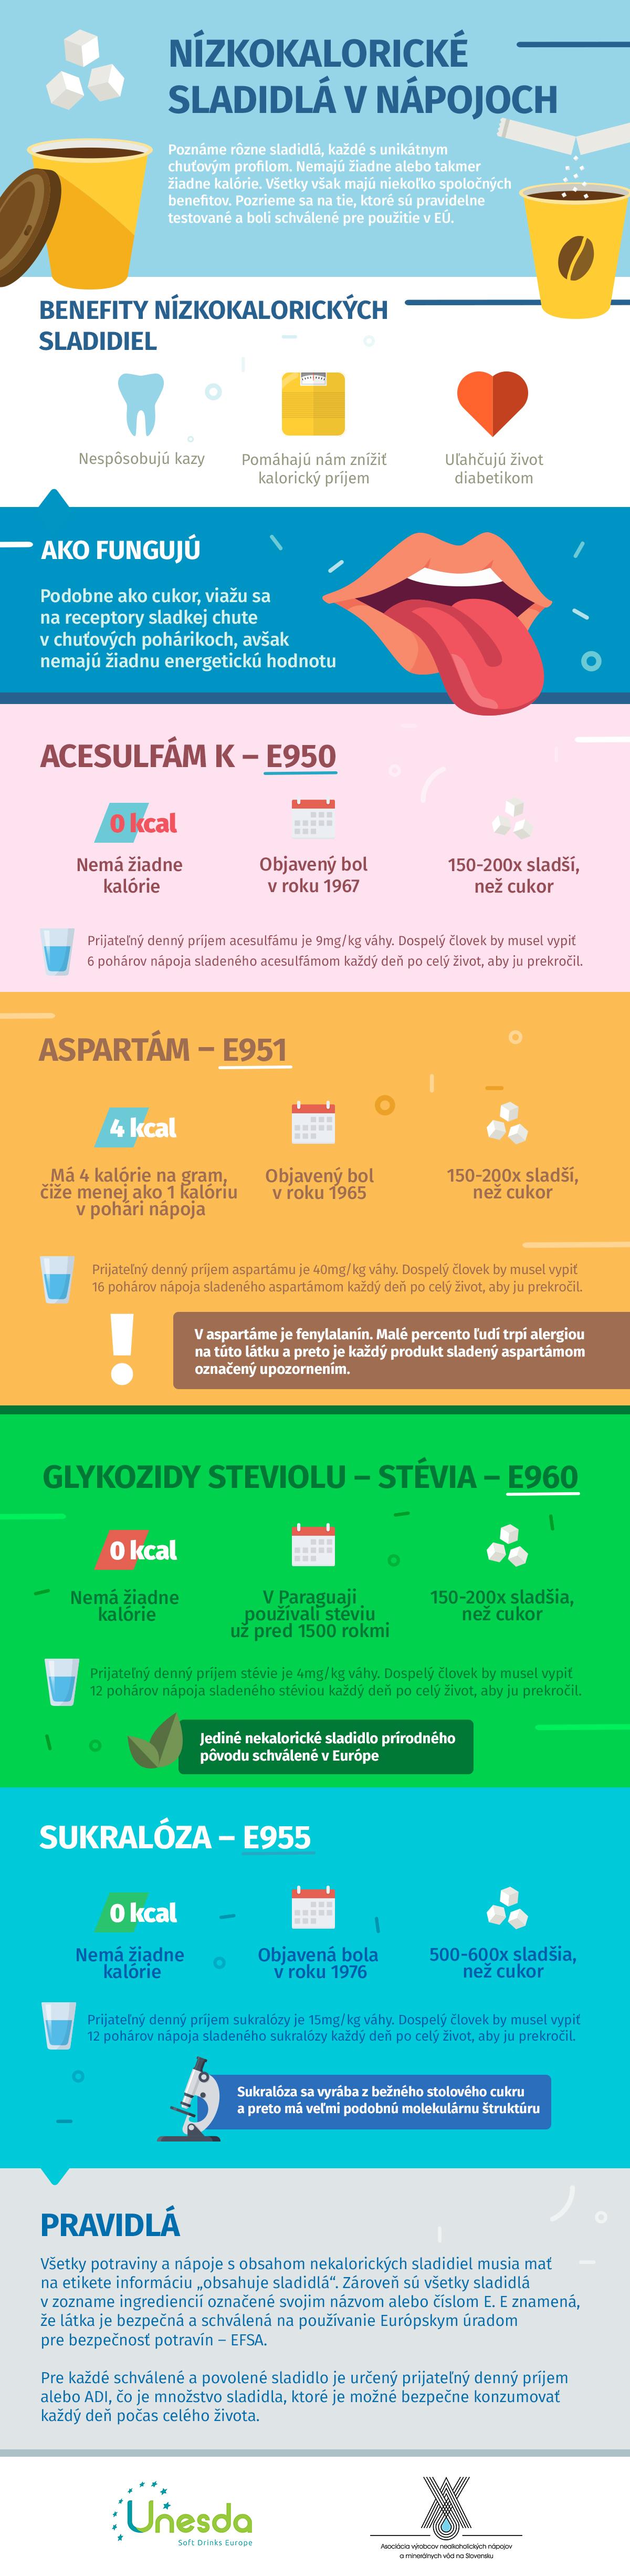 Infografika nekaloricke sladidla